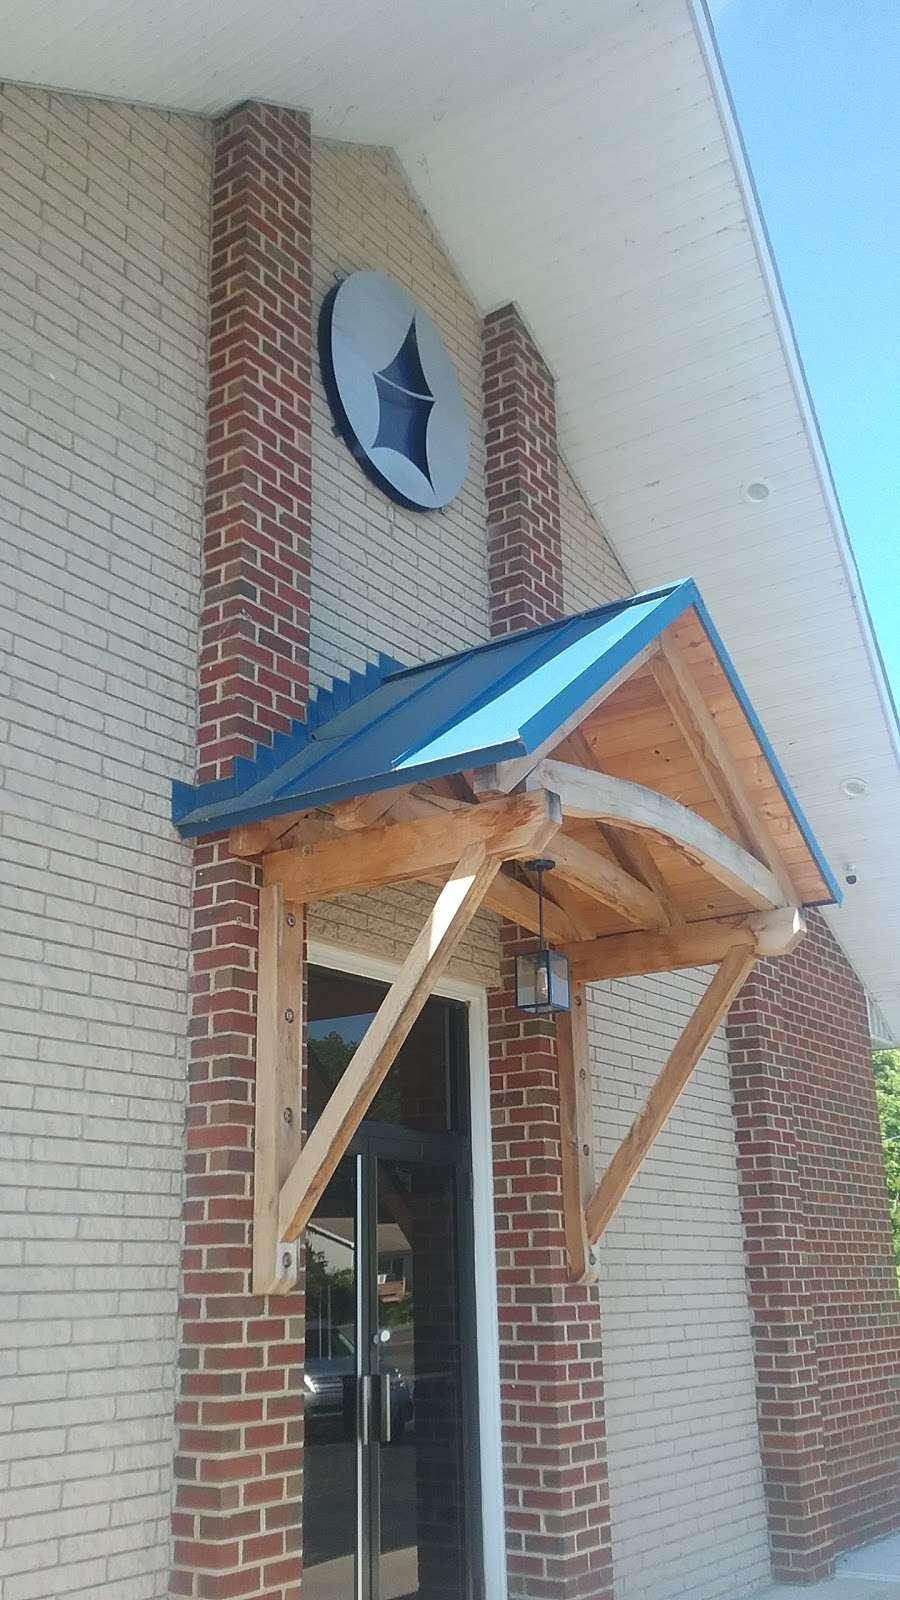 Hope Community Church - church  | Photo 7 of 9 | Address: 6867 Hedgesville Rd, Hedgesville, WV 25427, USA | Phone: (304) 754-8020